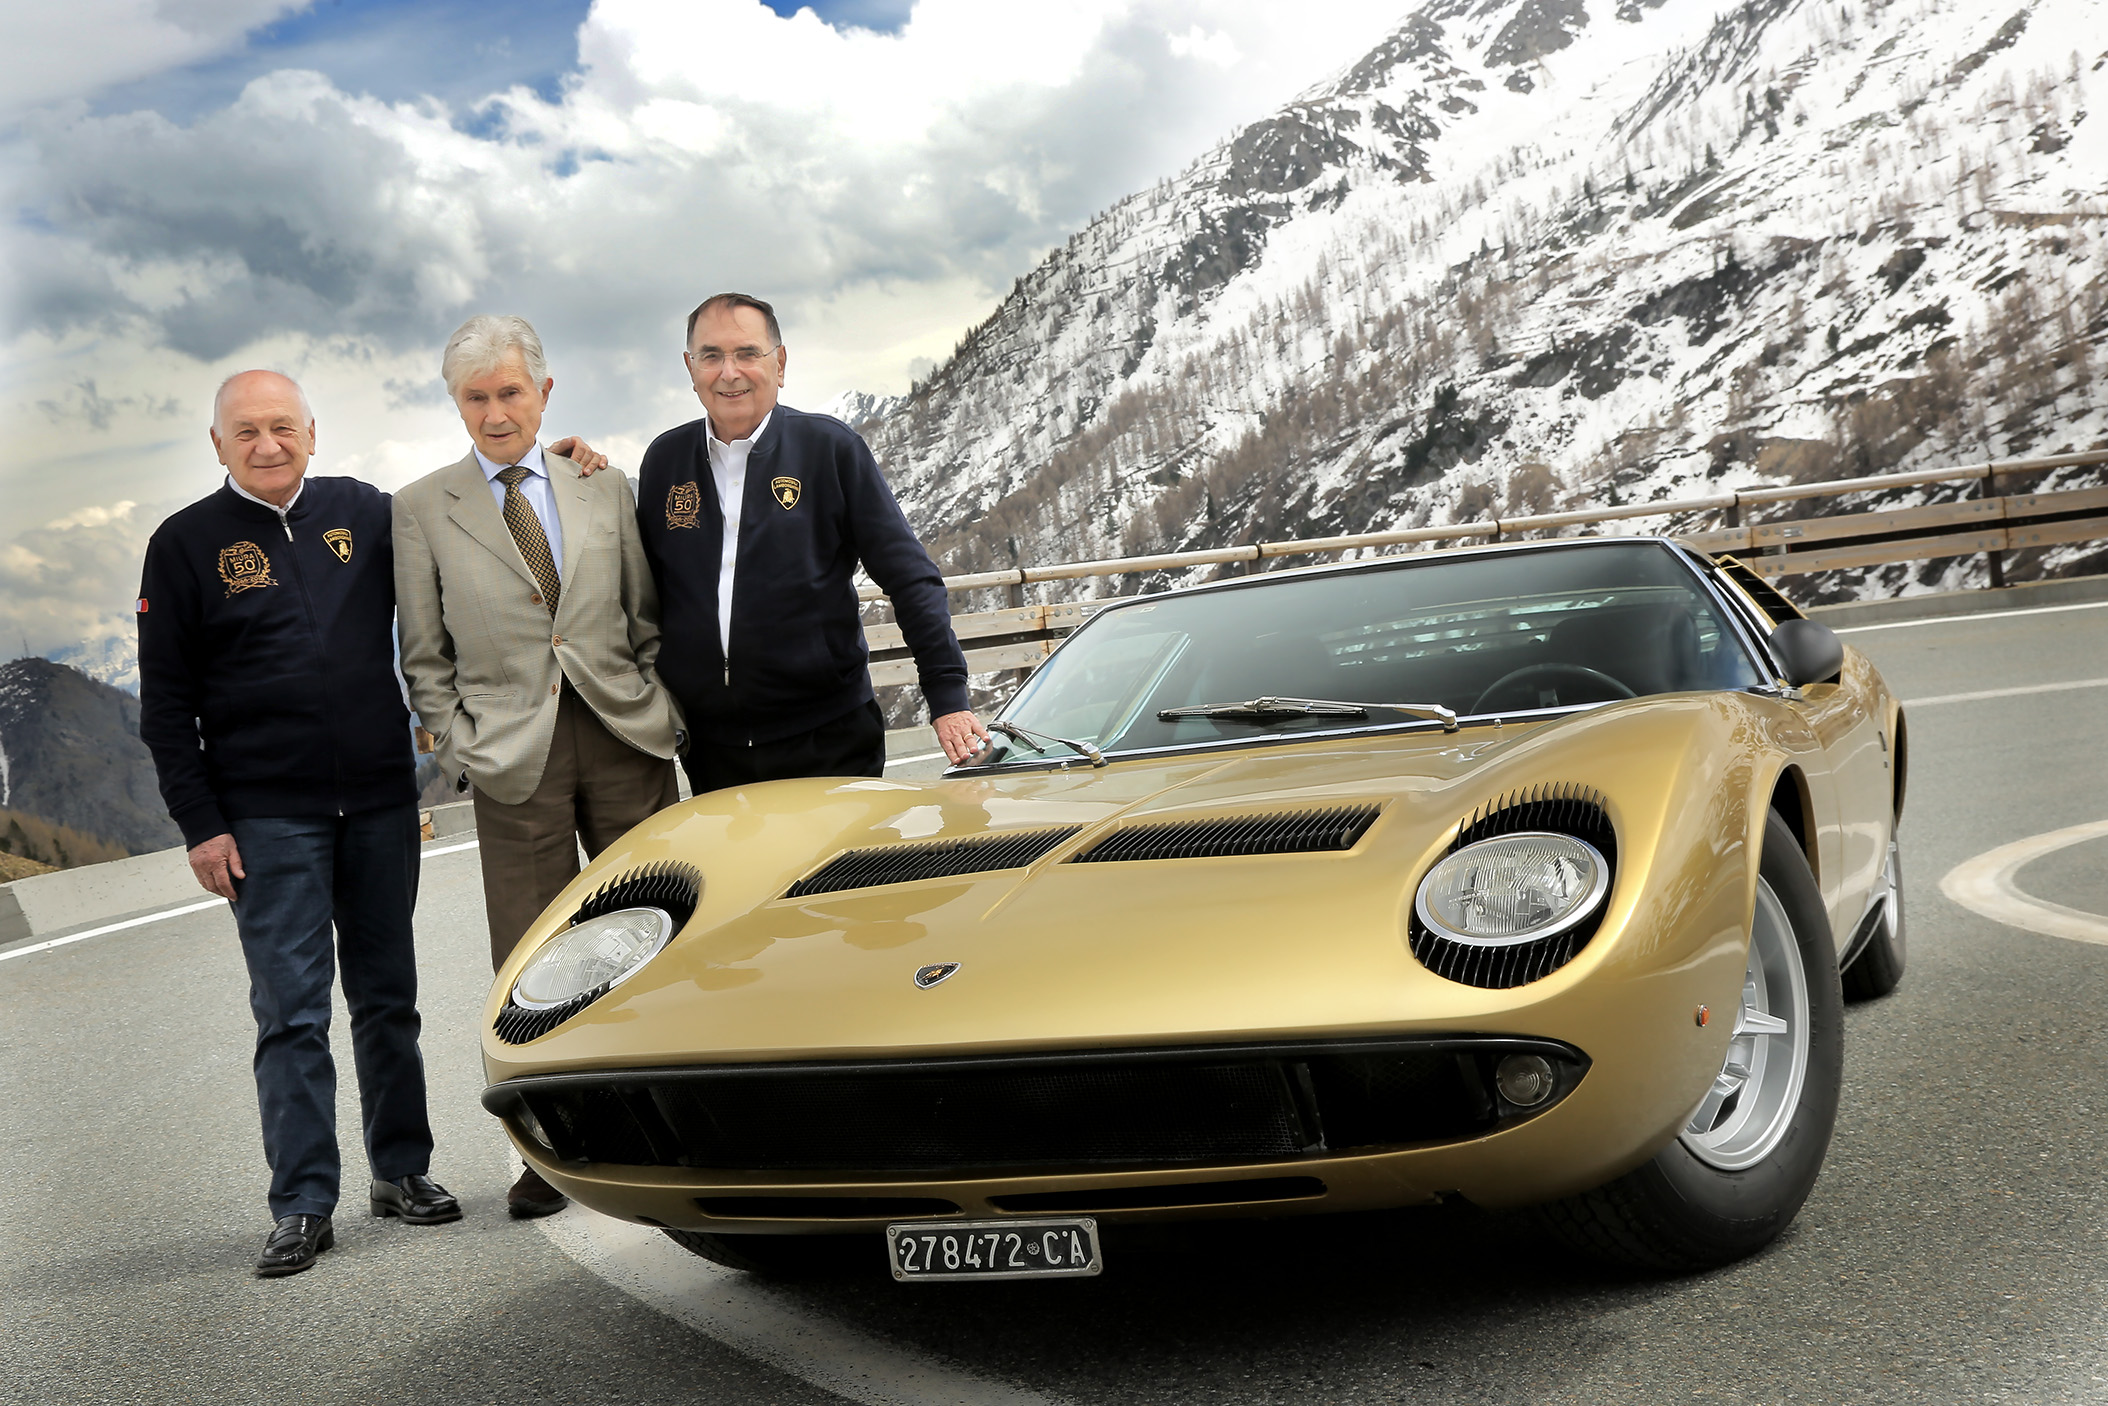 Lamborghini Miura P400 - The Italian Job - 50th Anniversary - Autovisie.nl